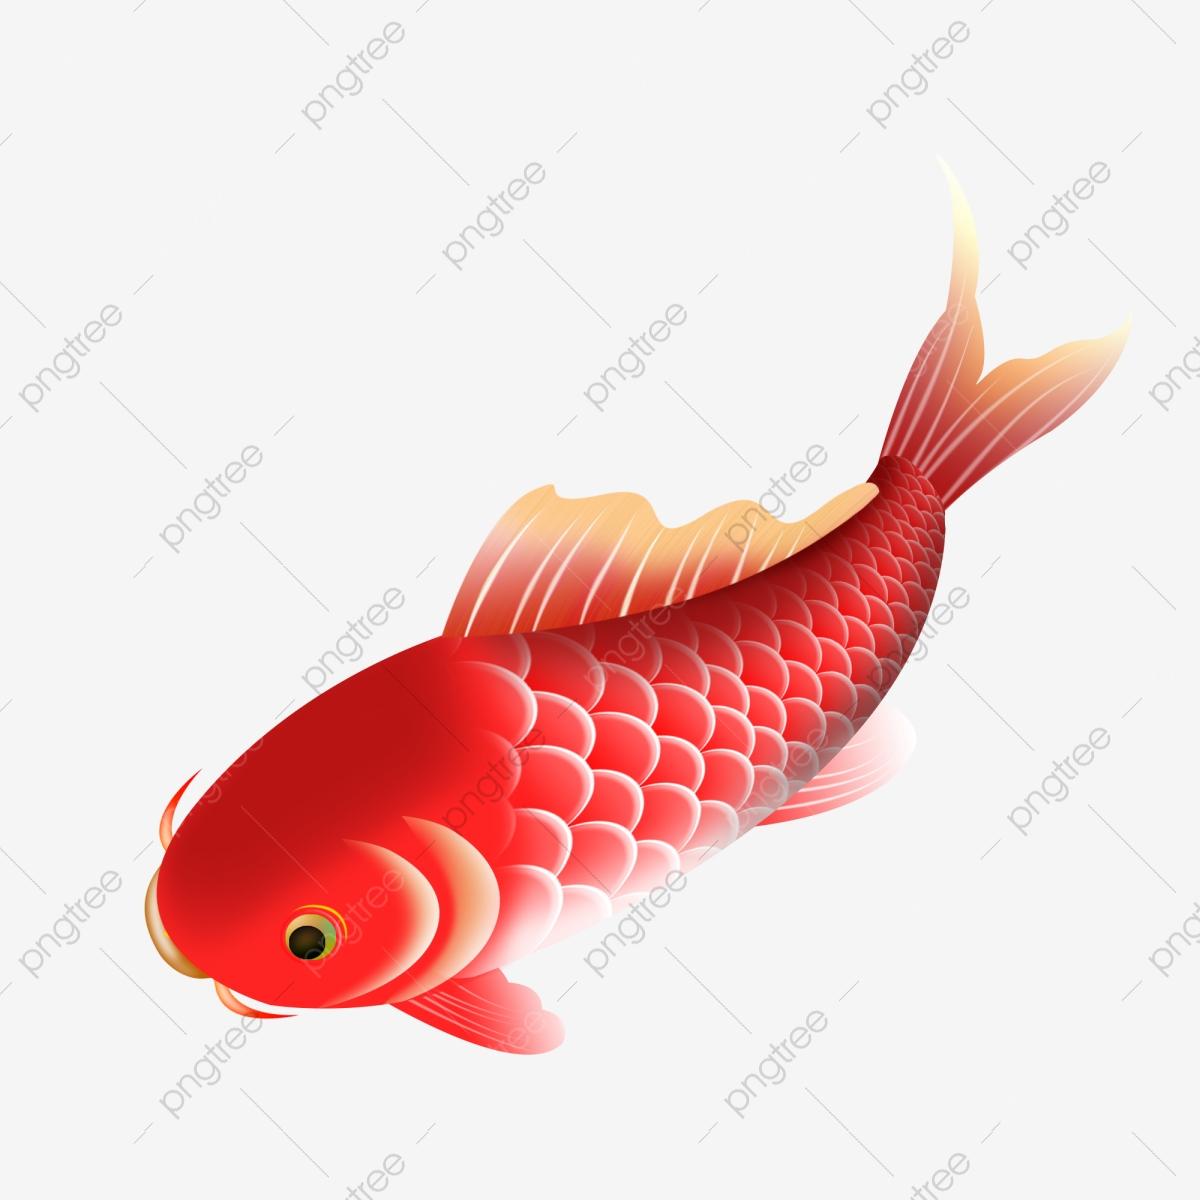 Jumping Fish, Fish Clipart, Free, Jump PNG Transparent Clipart Image.